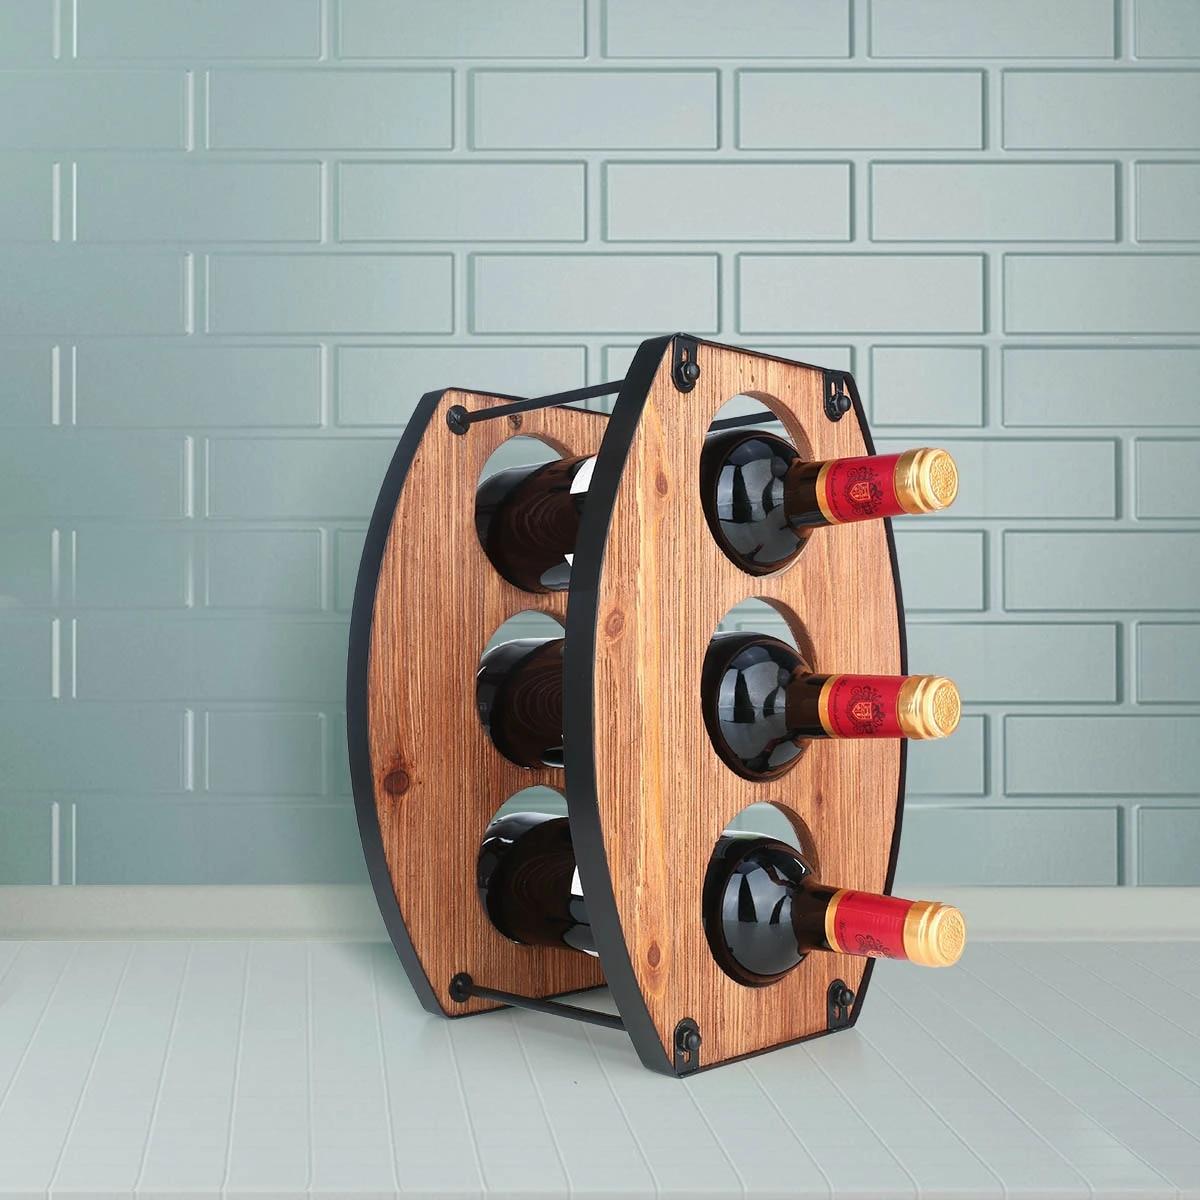 Vintage Brown Wood Folding Wine Rack  Bar Accessory  Home Decor